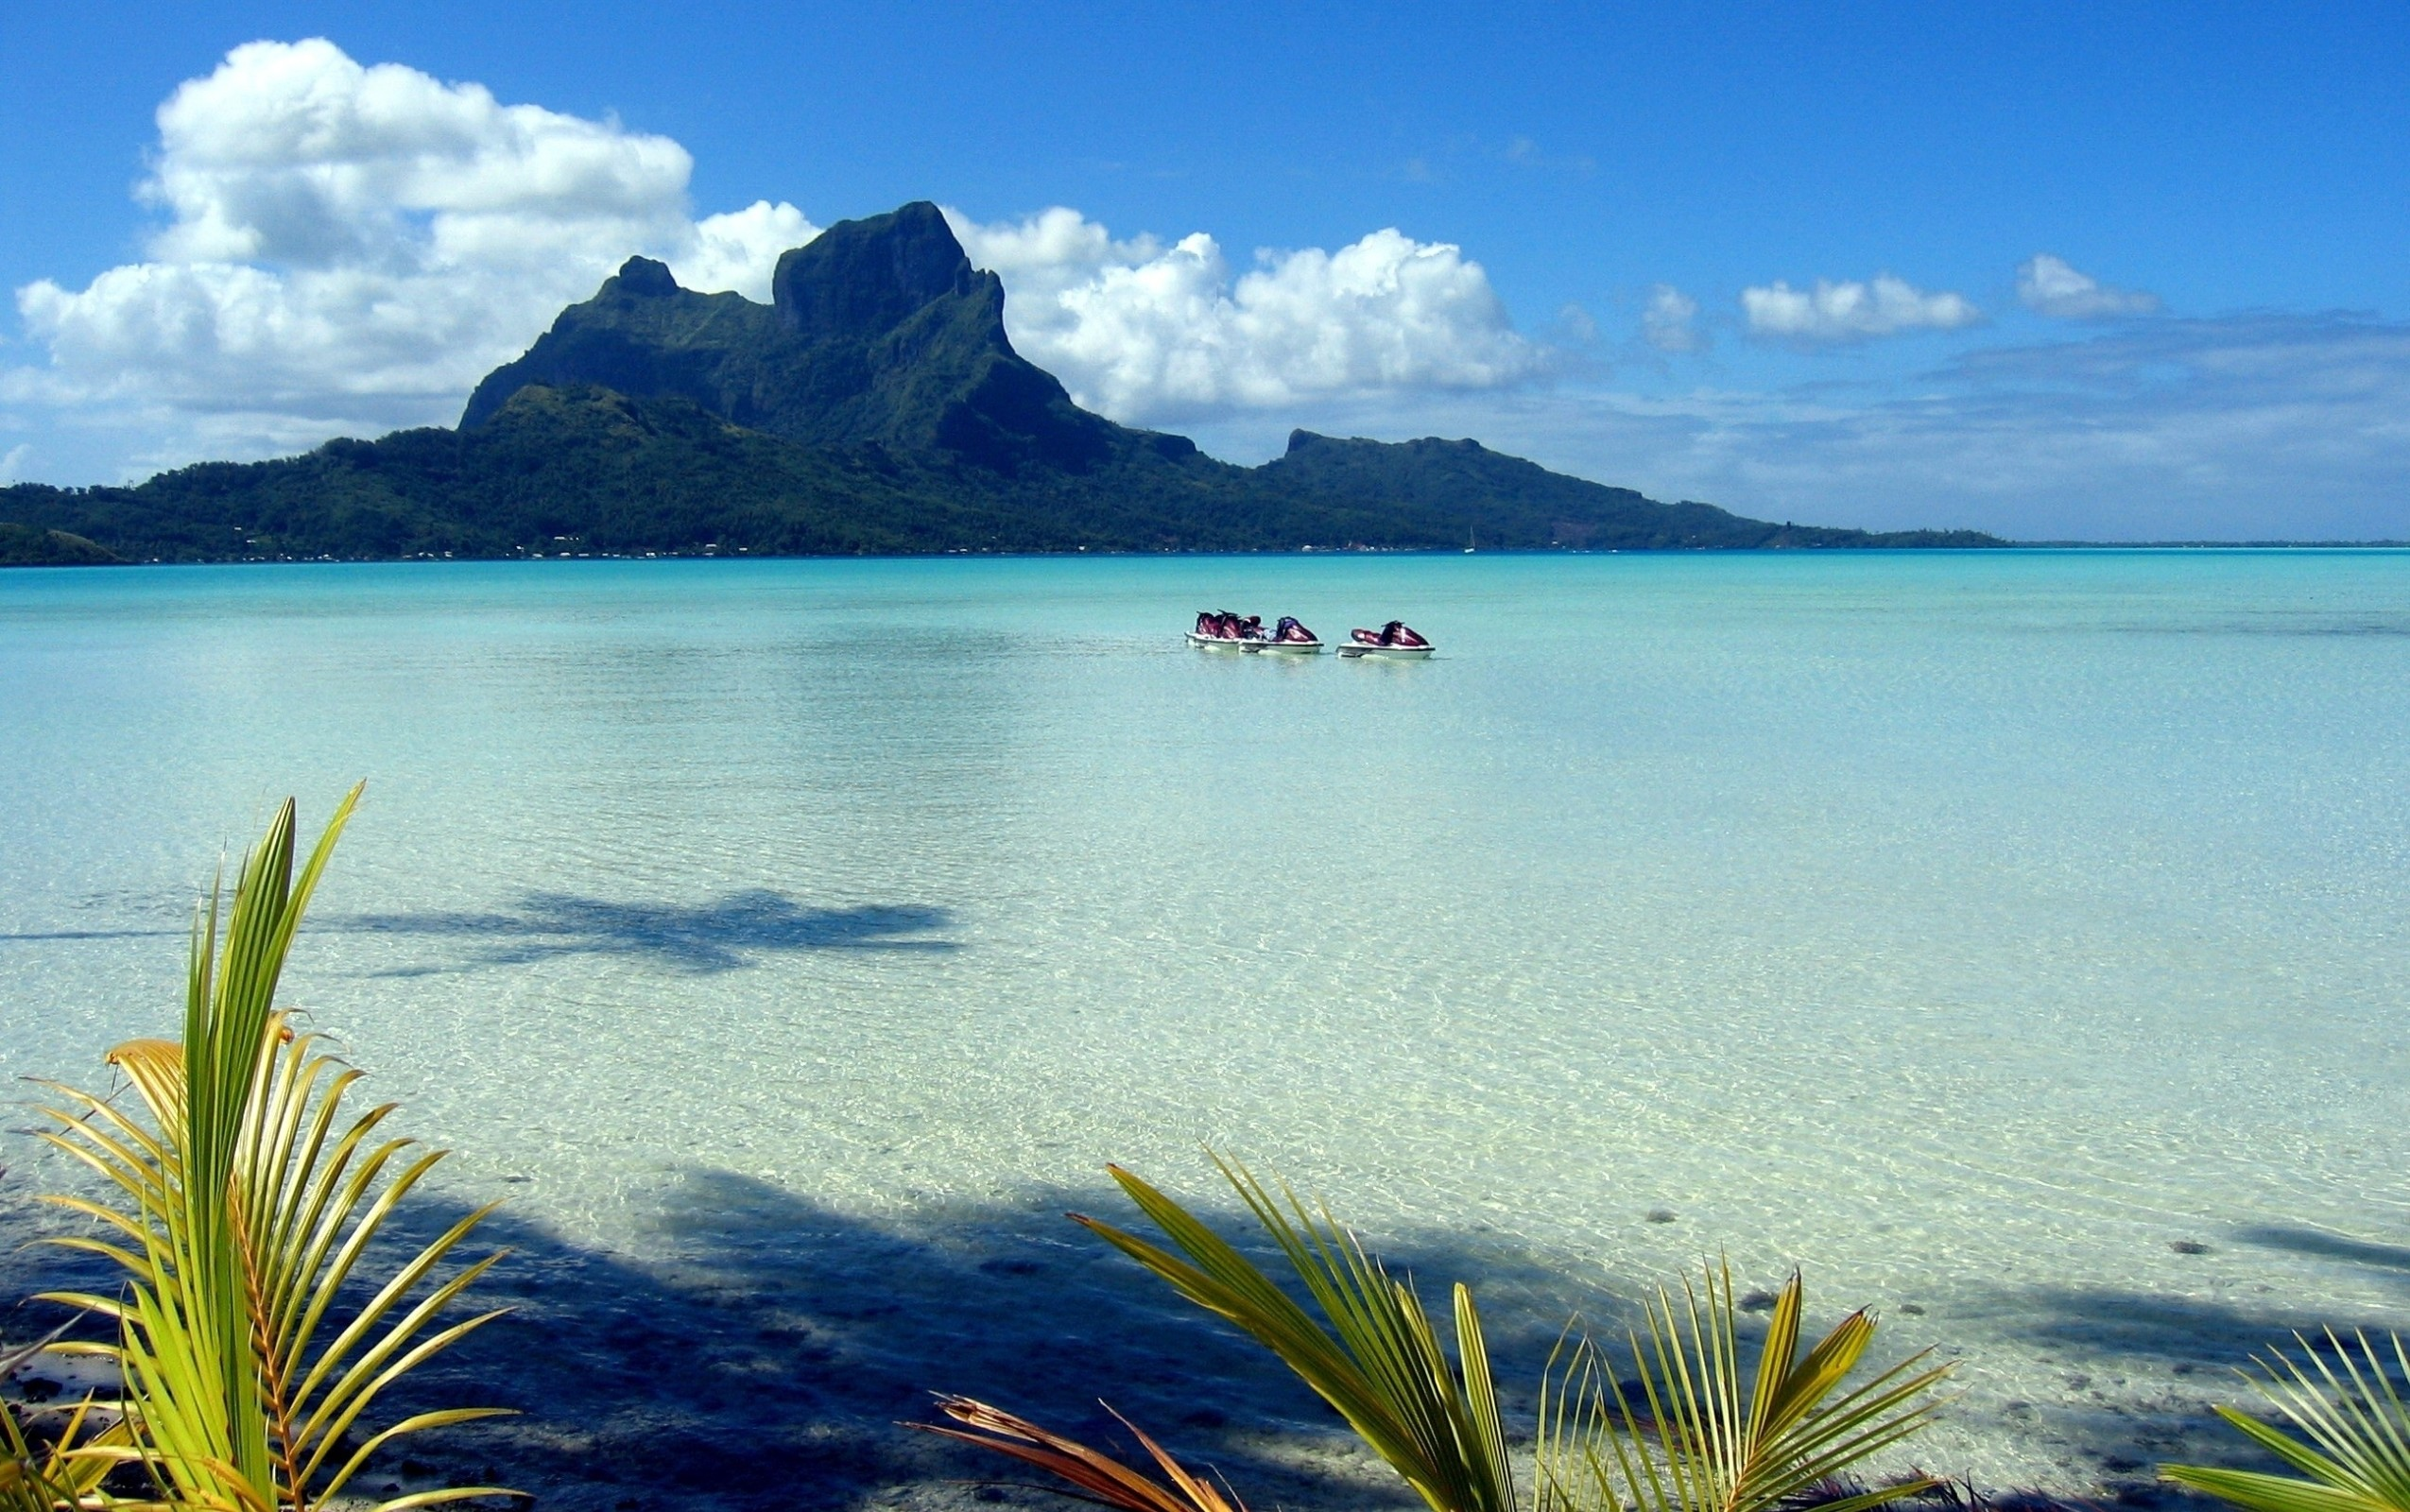 Bora Bora Bungalows 4k Hd Desktop Wallpaper For Wide: Bora Bora Backgrounds ·①